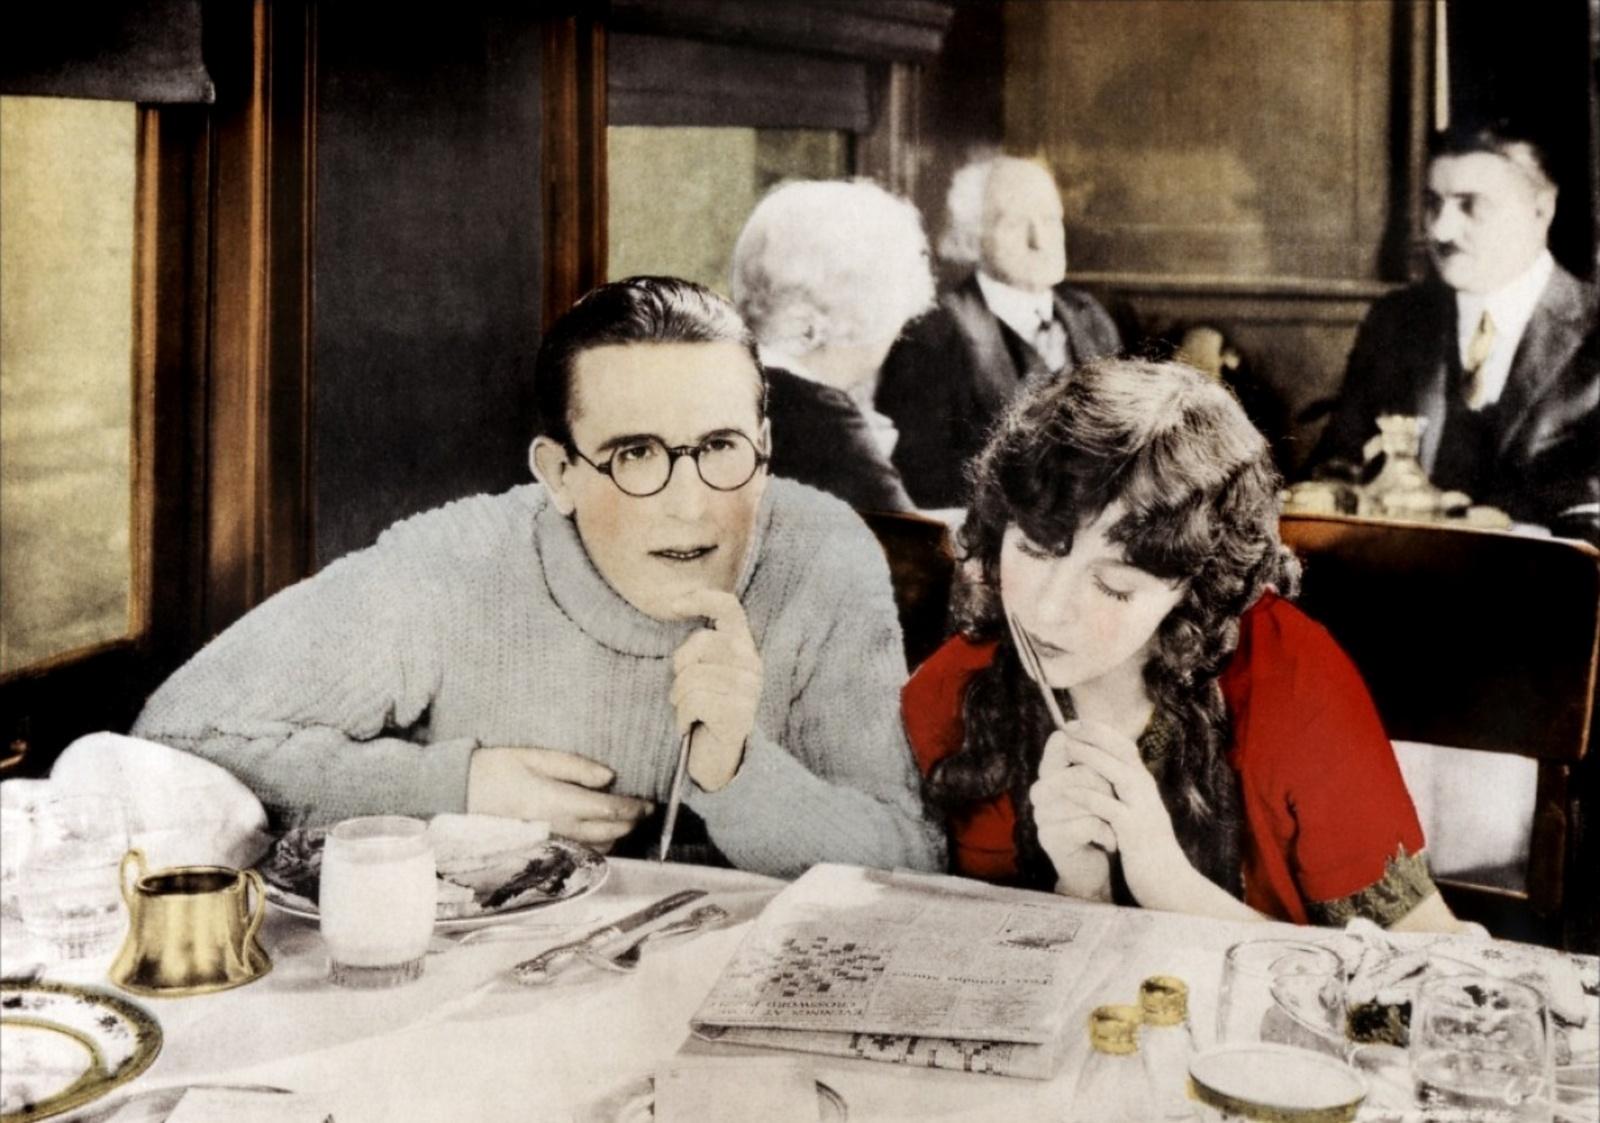 Harold Lloyd and Jobyna Ralston in The Freshman (1925)